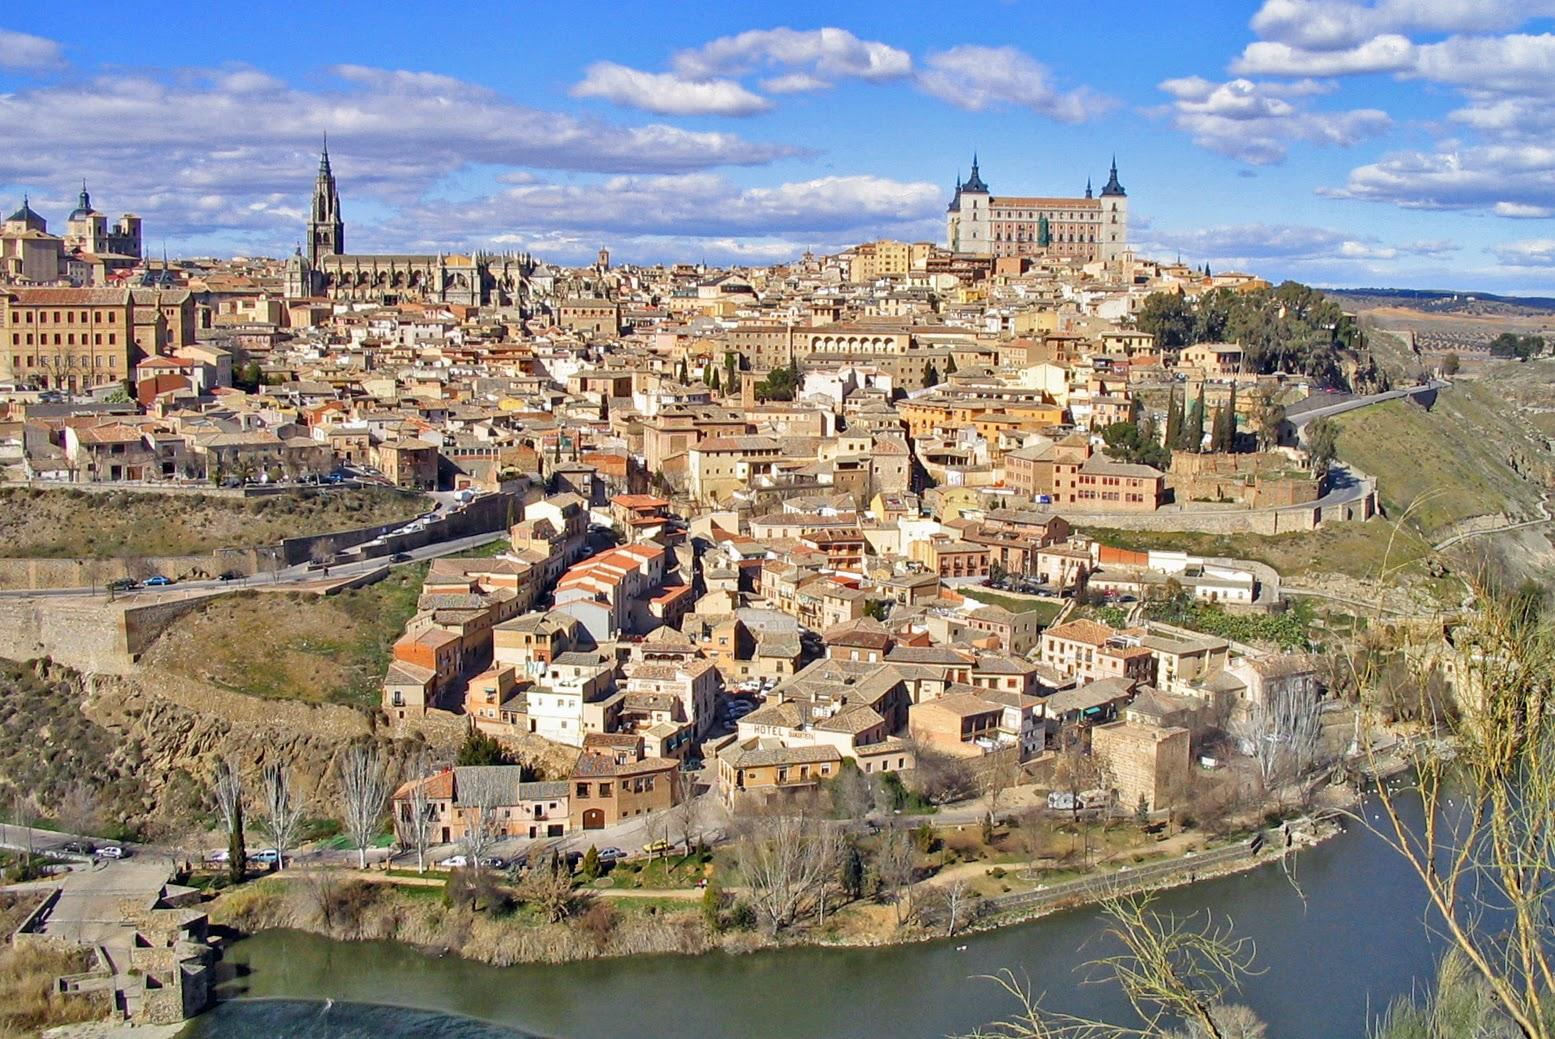 Visita Toledo, España